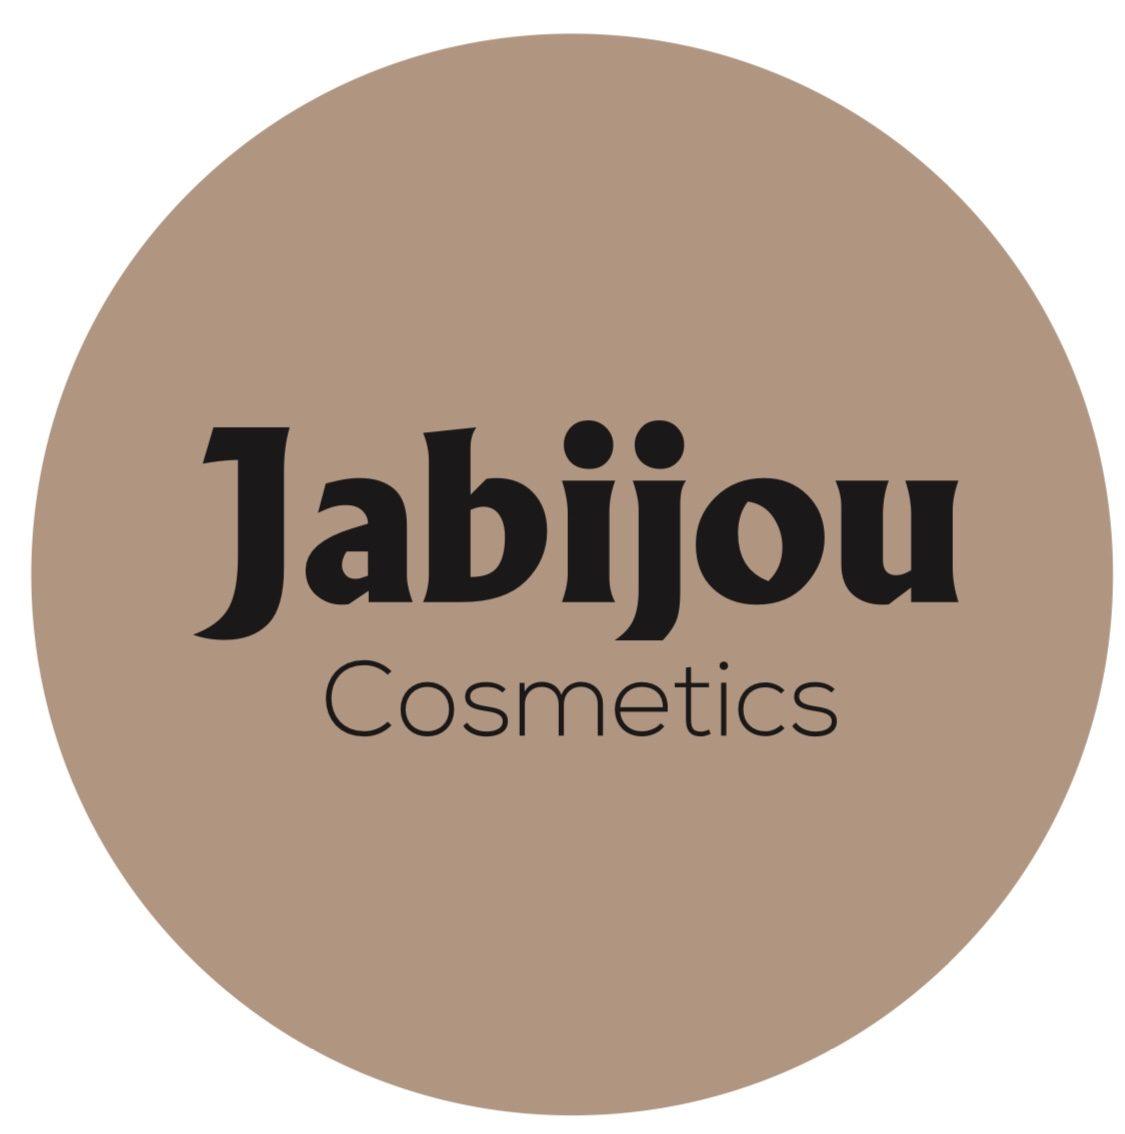 Jabijou Cosmetics